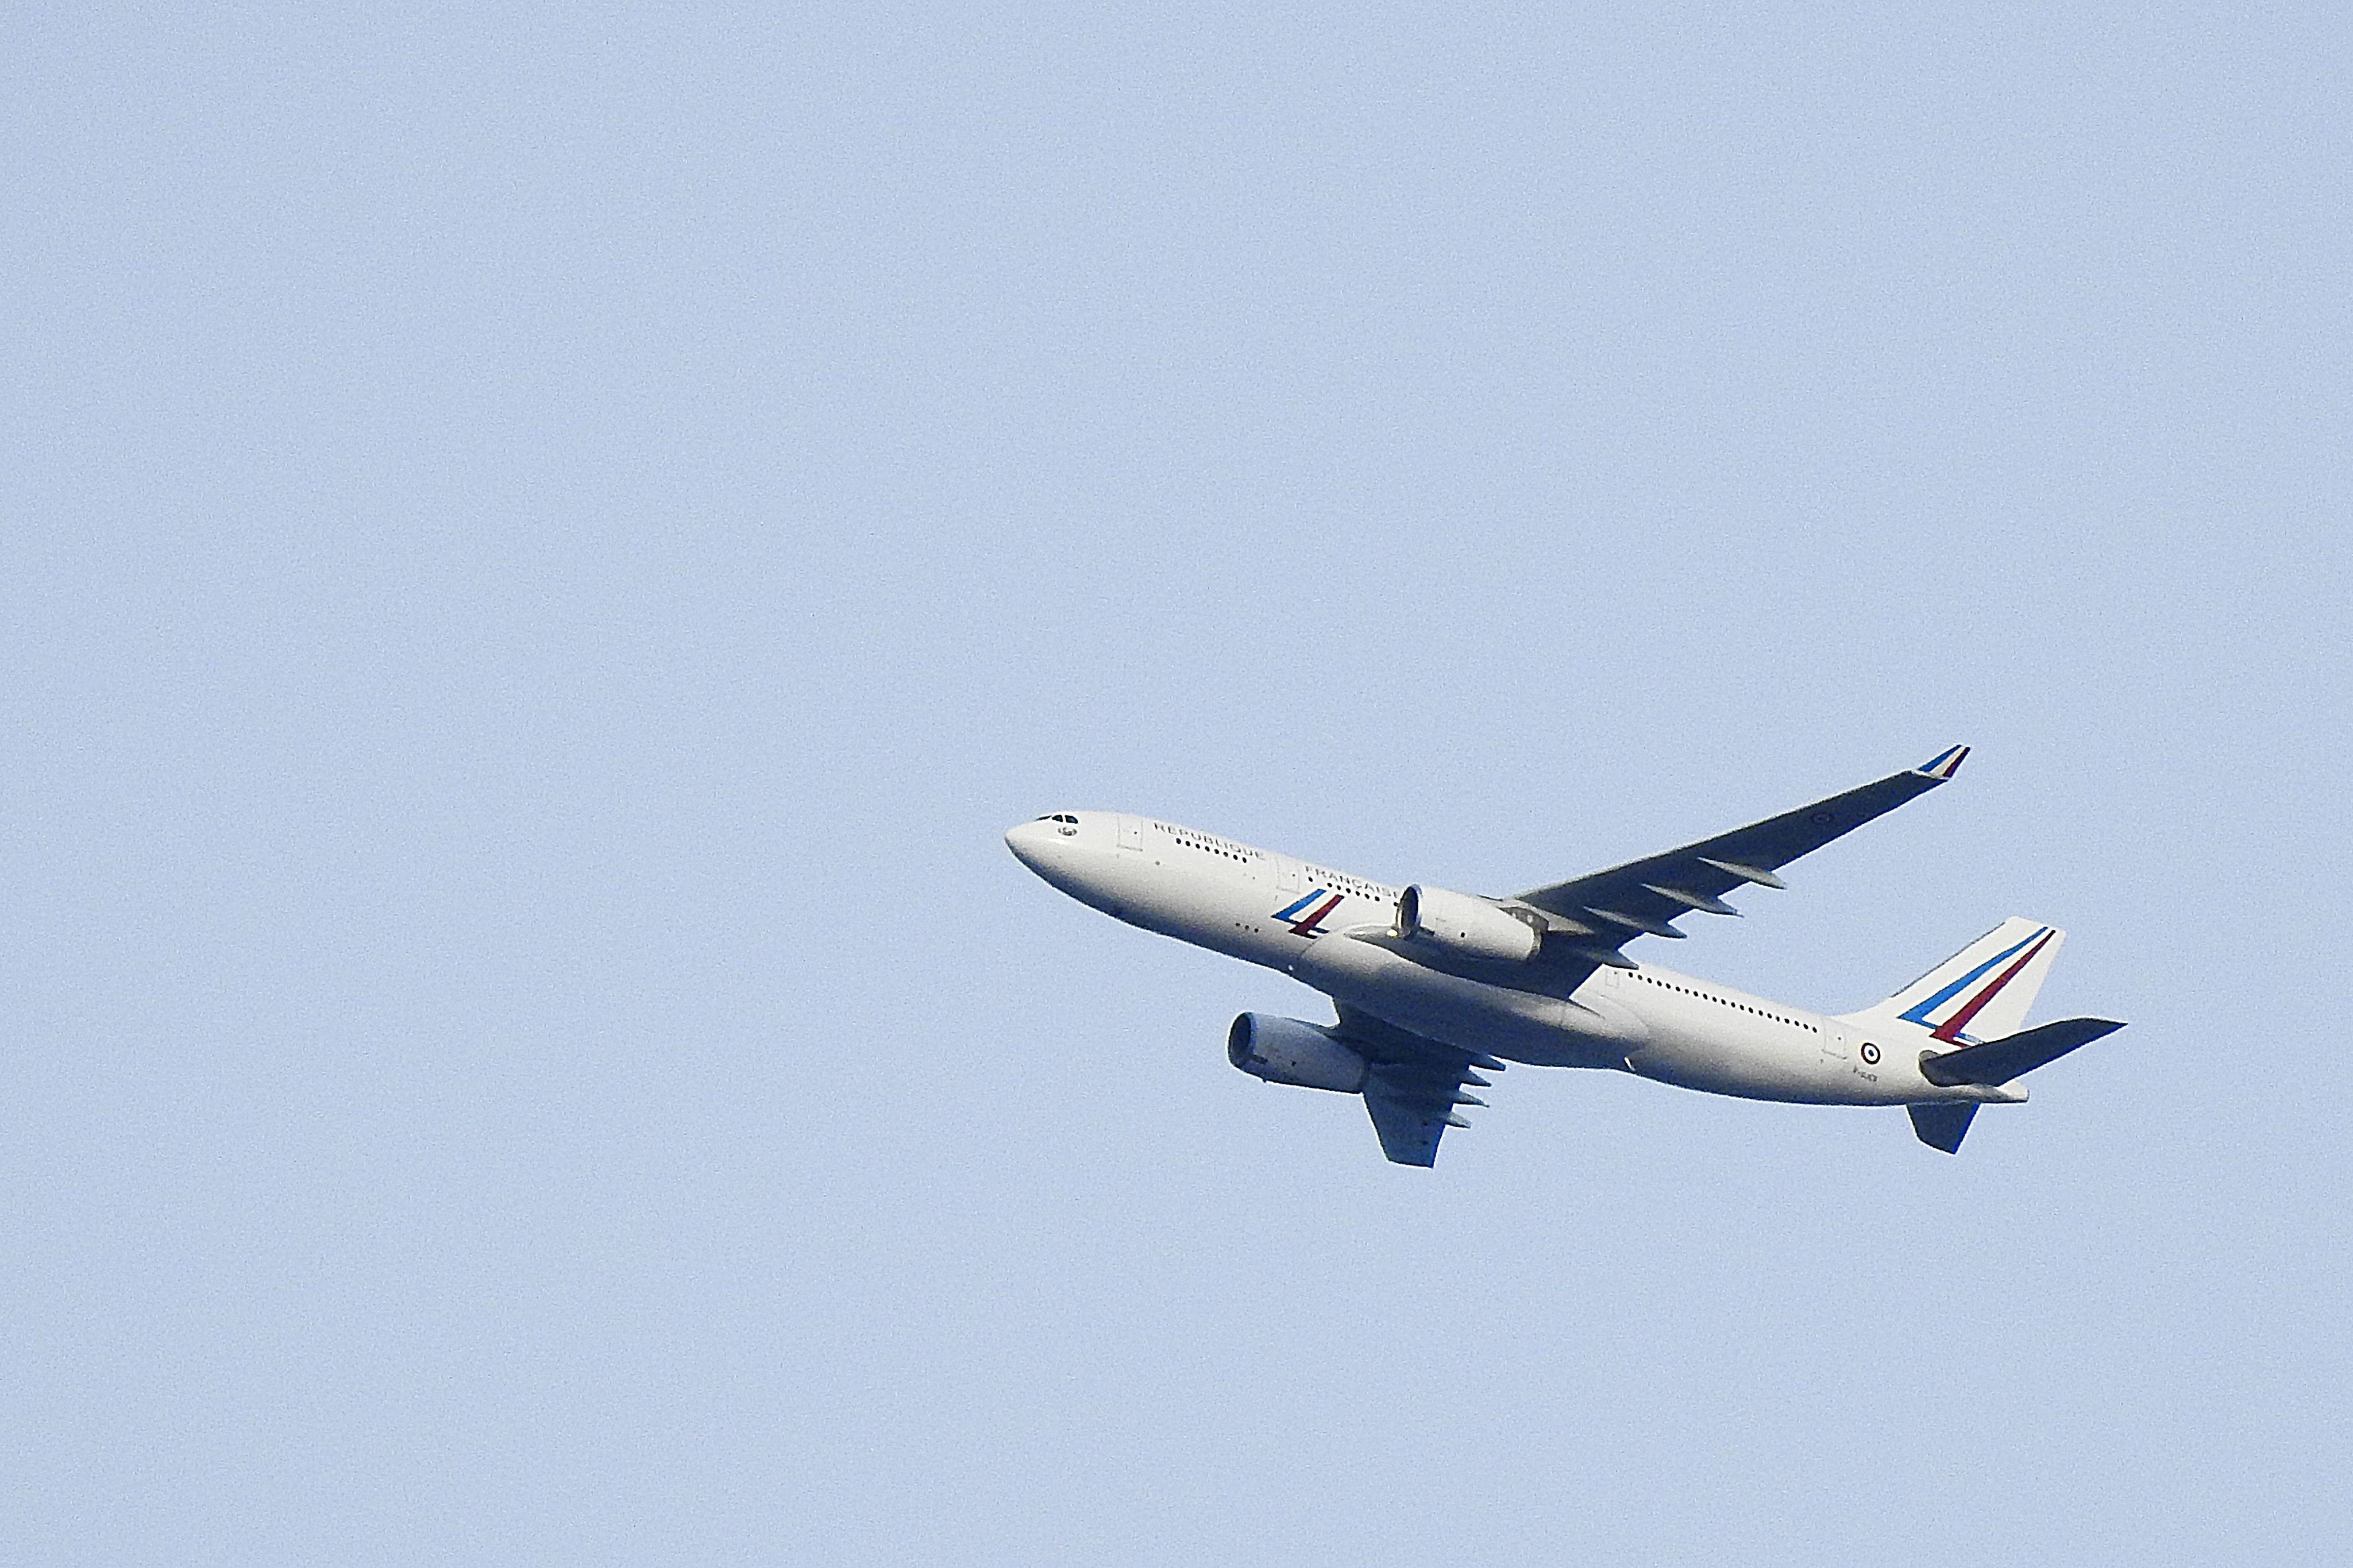 Un Airbus A330 survolant Paris. (Illustration)